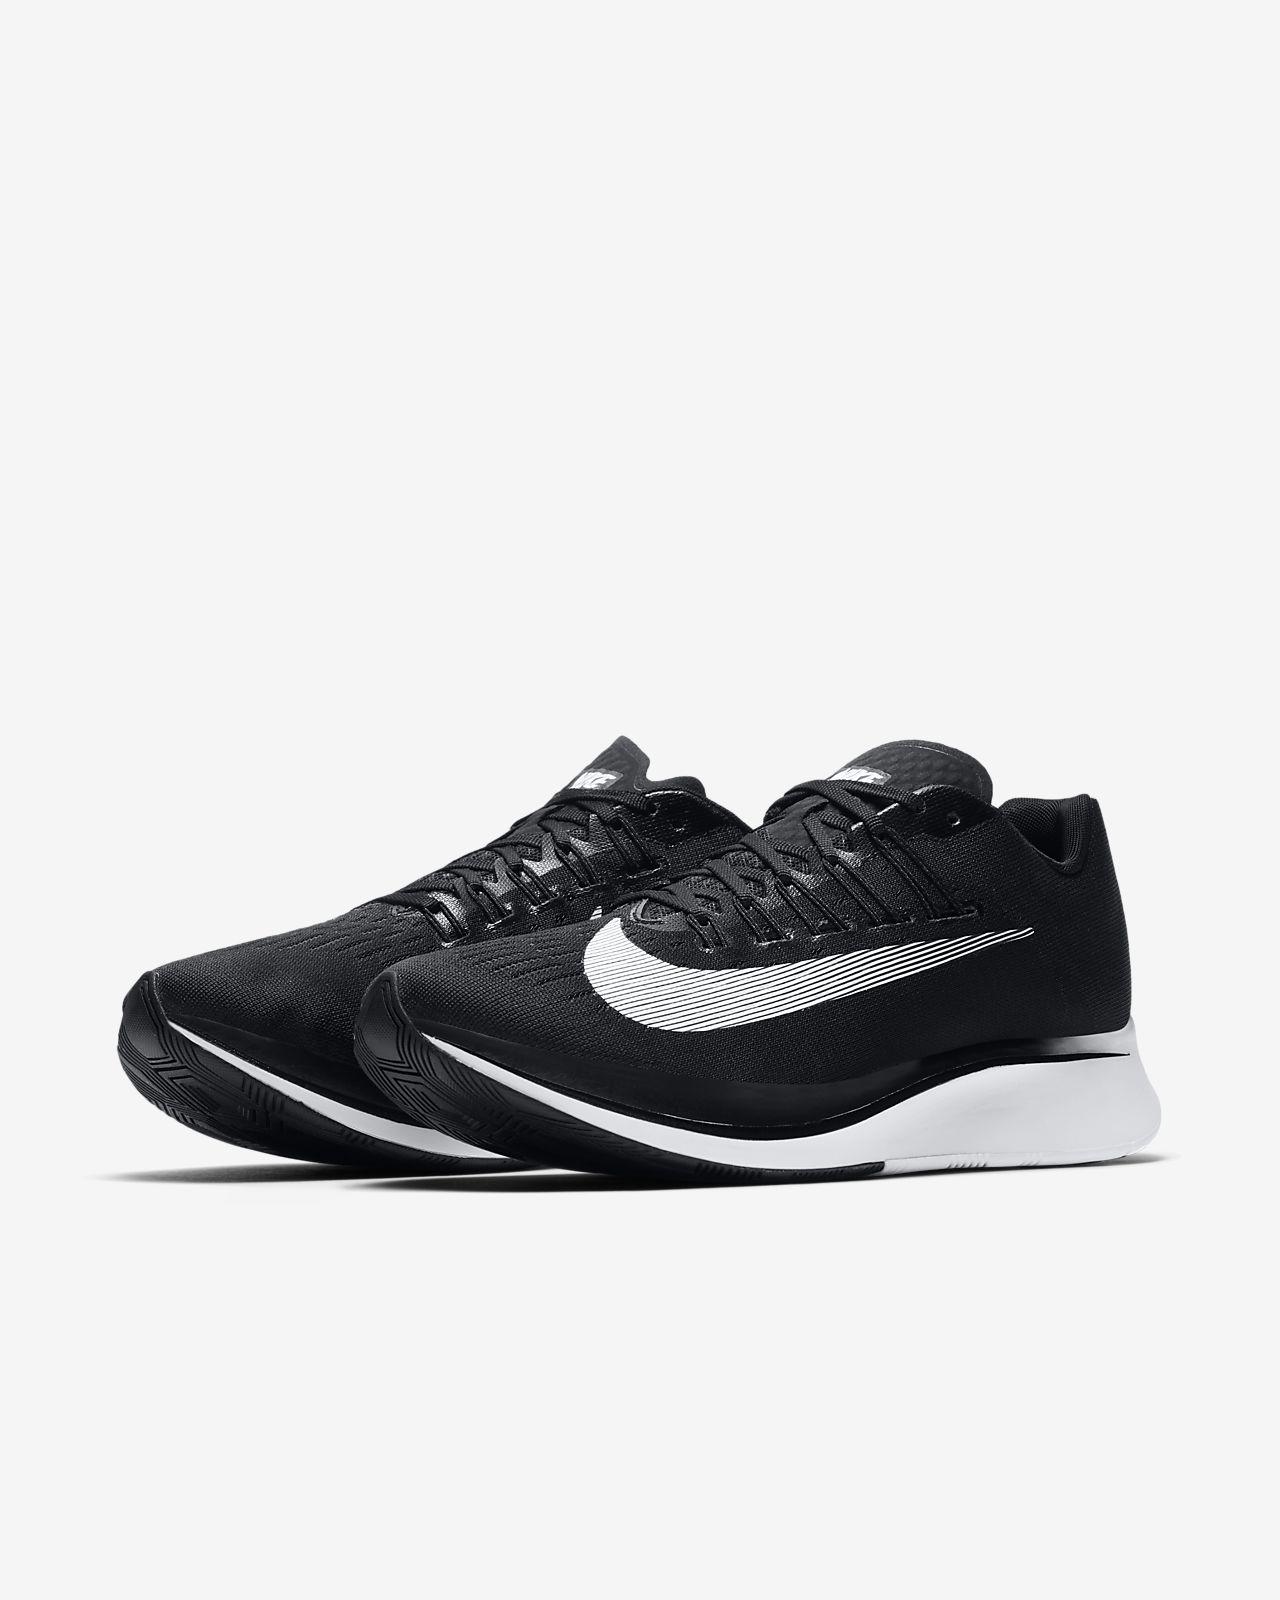 ... Nike Zoom Fly Men's Running Shoe